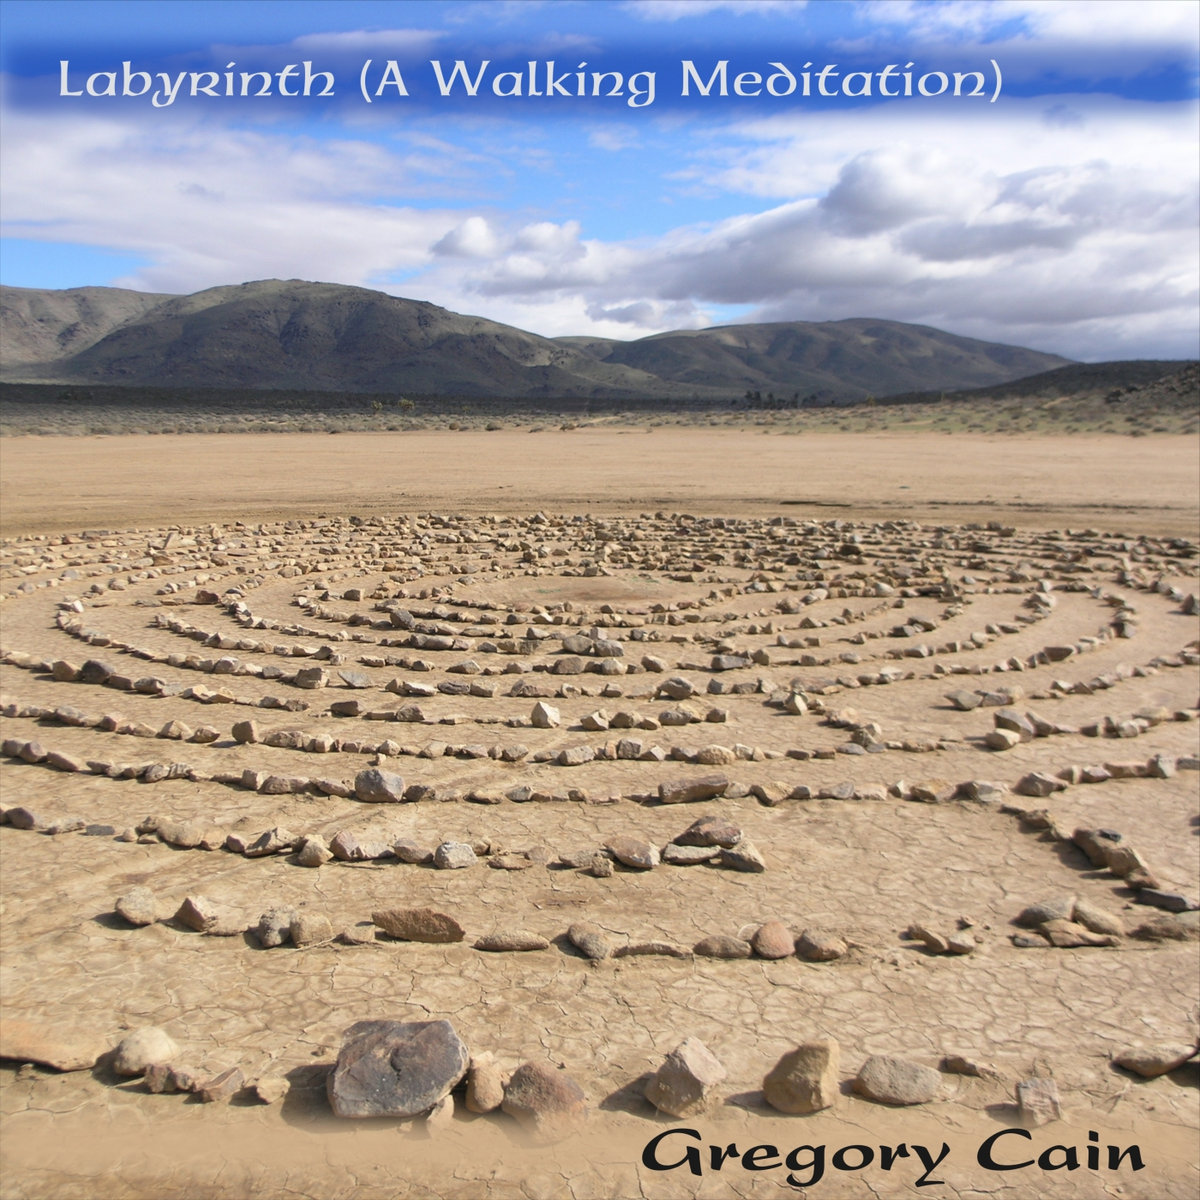 Labyrinth Walking Meditation